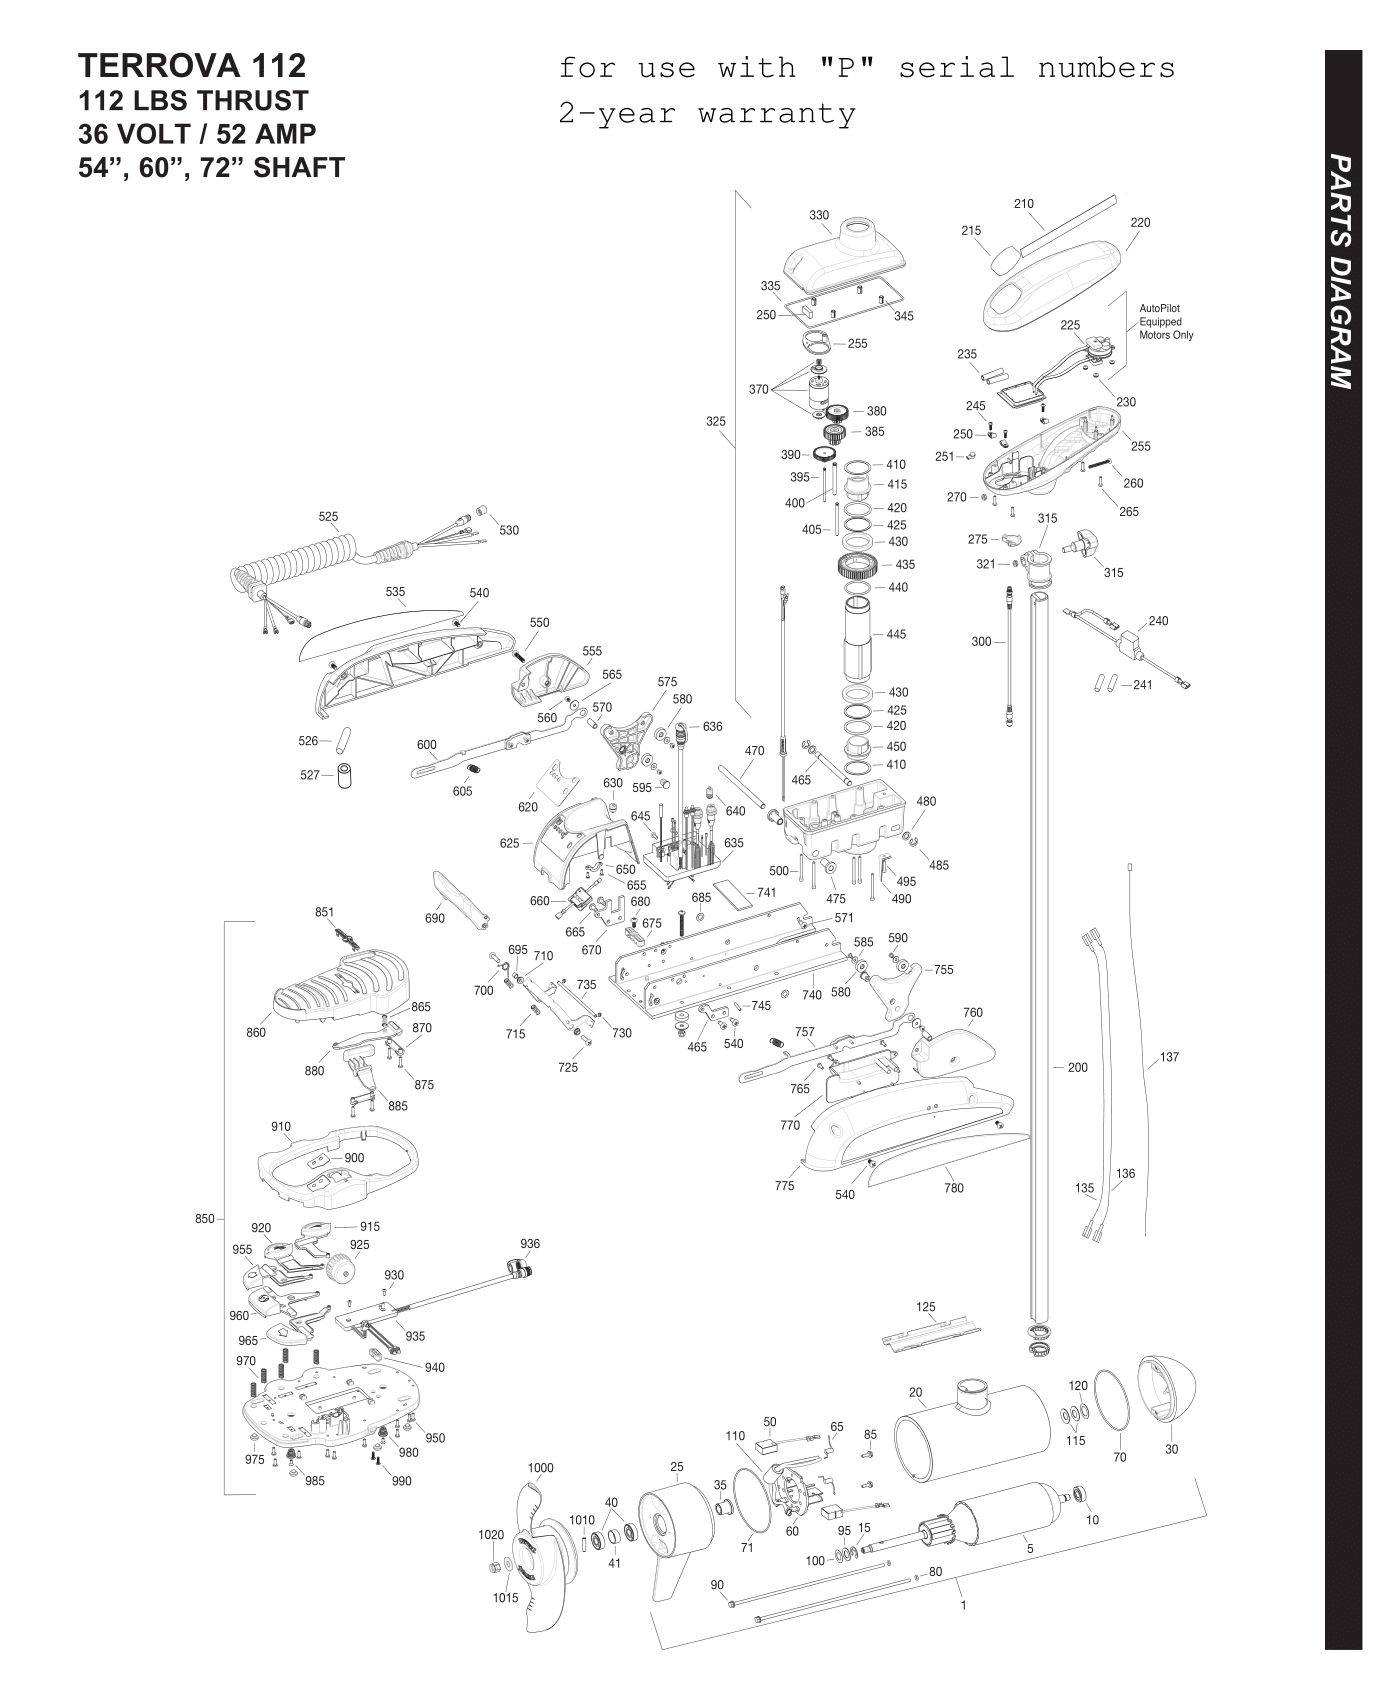 DIAGRAM] Minn Kota Wireless Diagram FULL Version HD Quality Wireless Diagram  - K7901ASCHEMATIC4138.BEAUTYWELL.ITk7901aschematic4138.beautywell.it